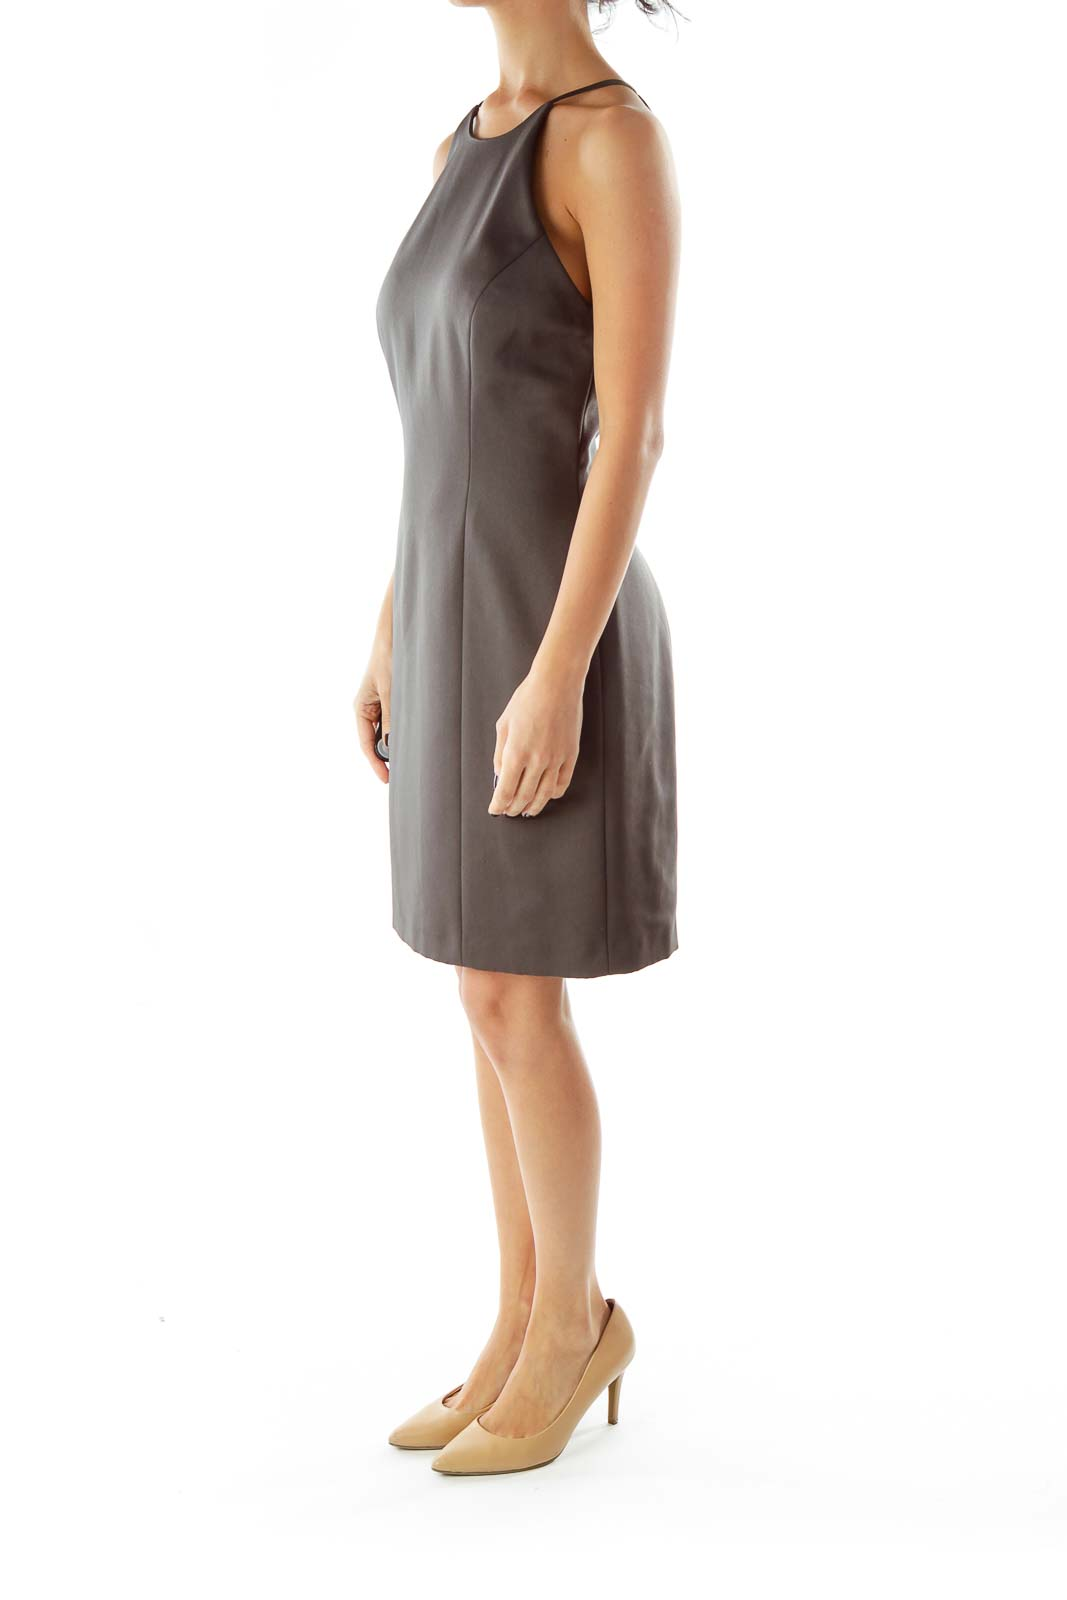 Gray A-Line Spaghetti Strap Cocktail Dress